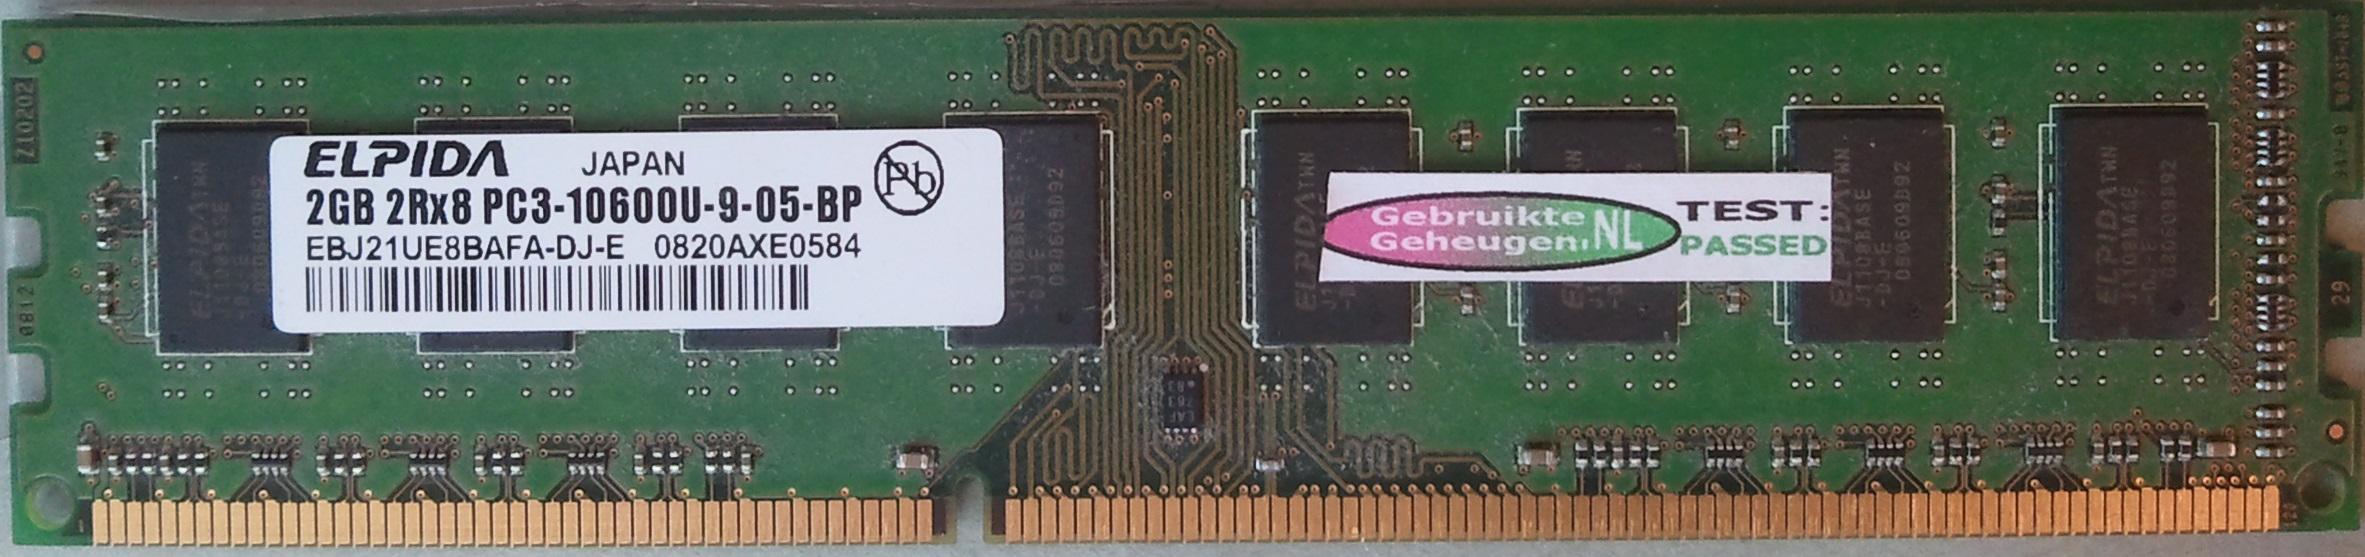 2GB 2Rx8 PC3-10600U-9-05-BP